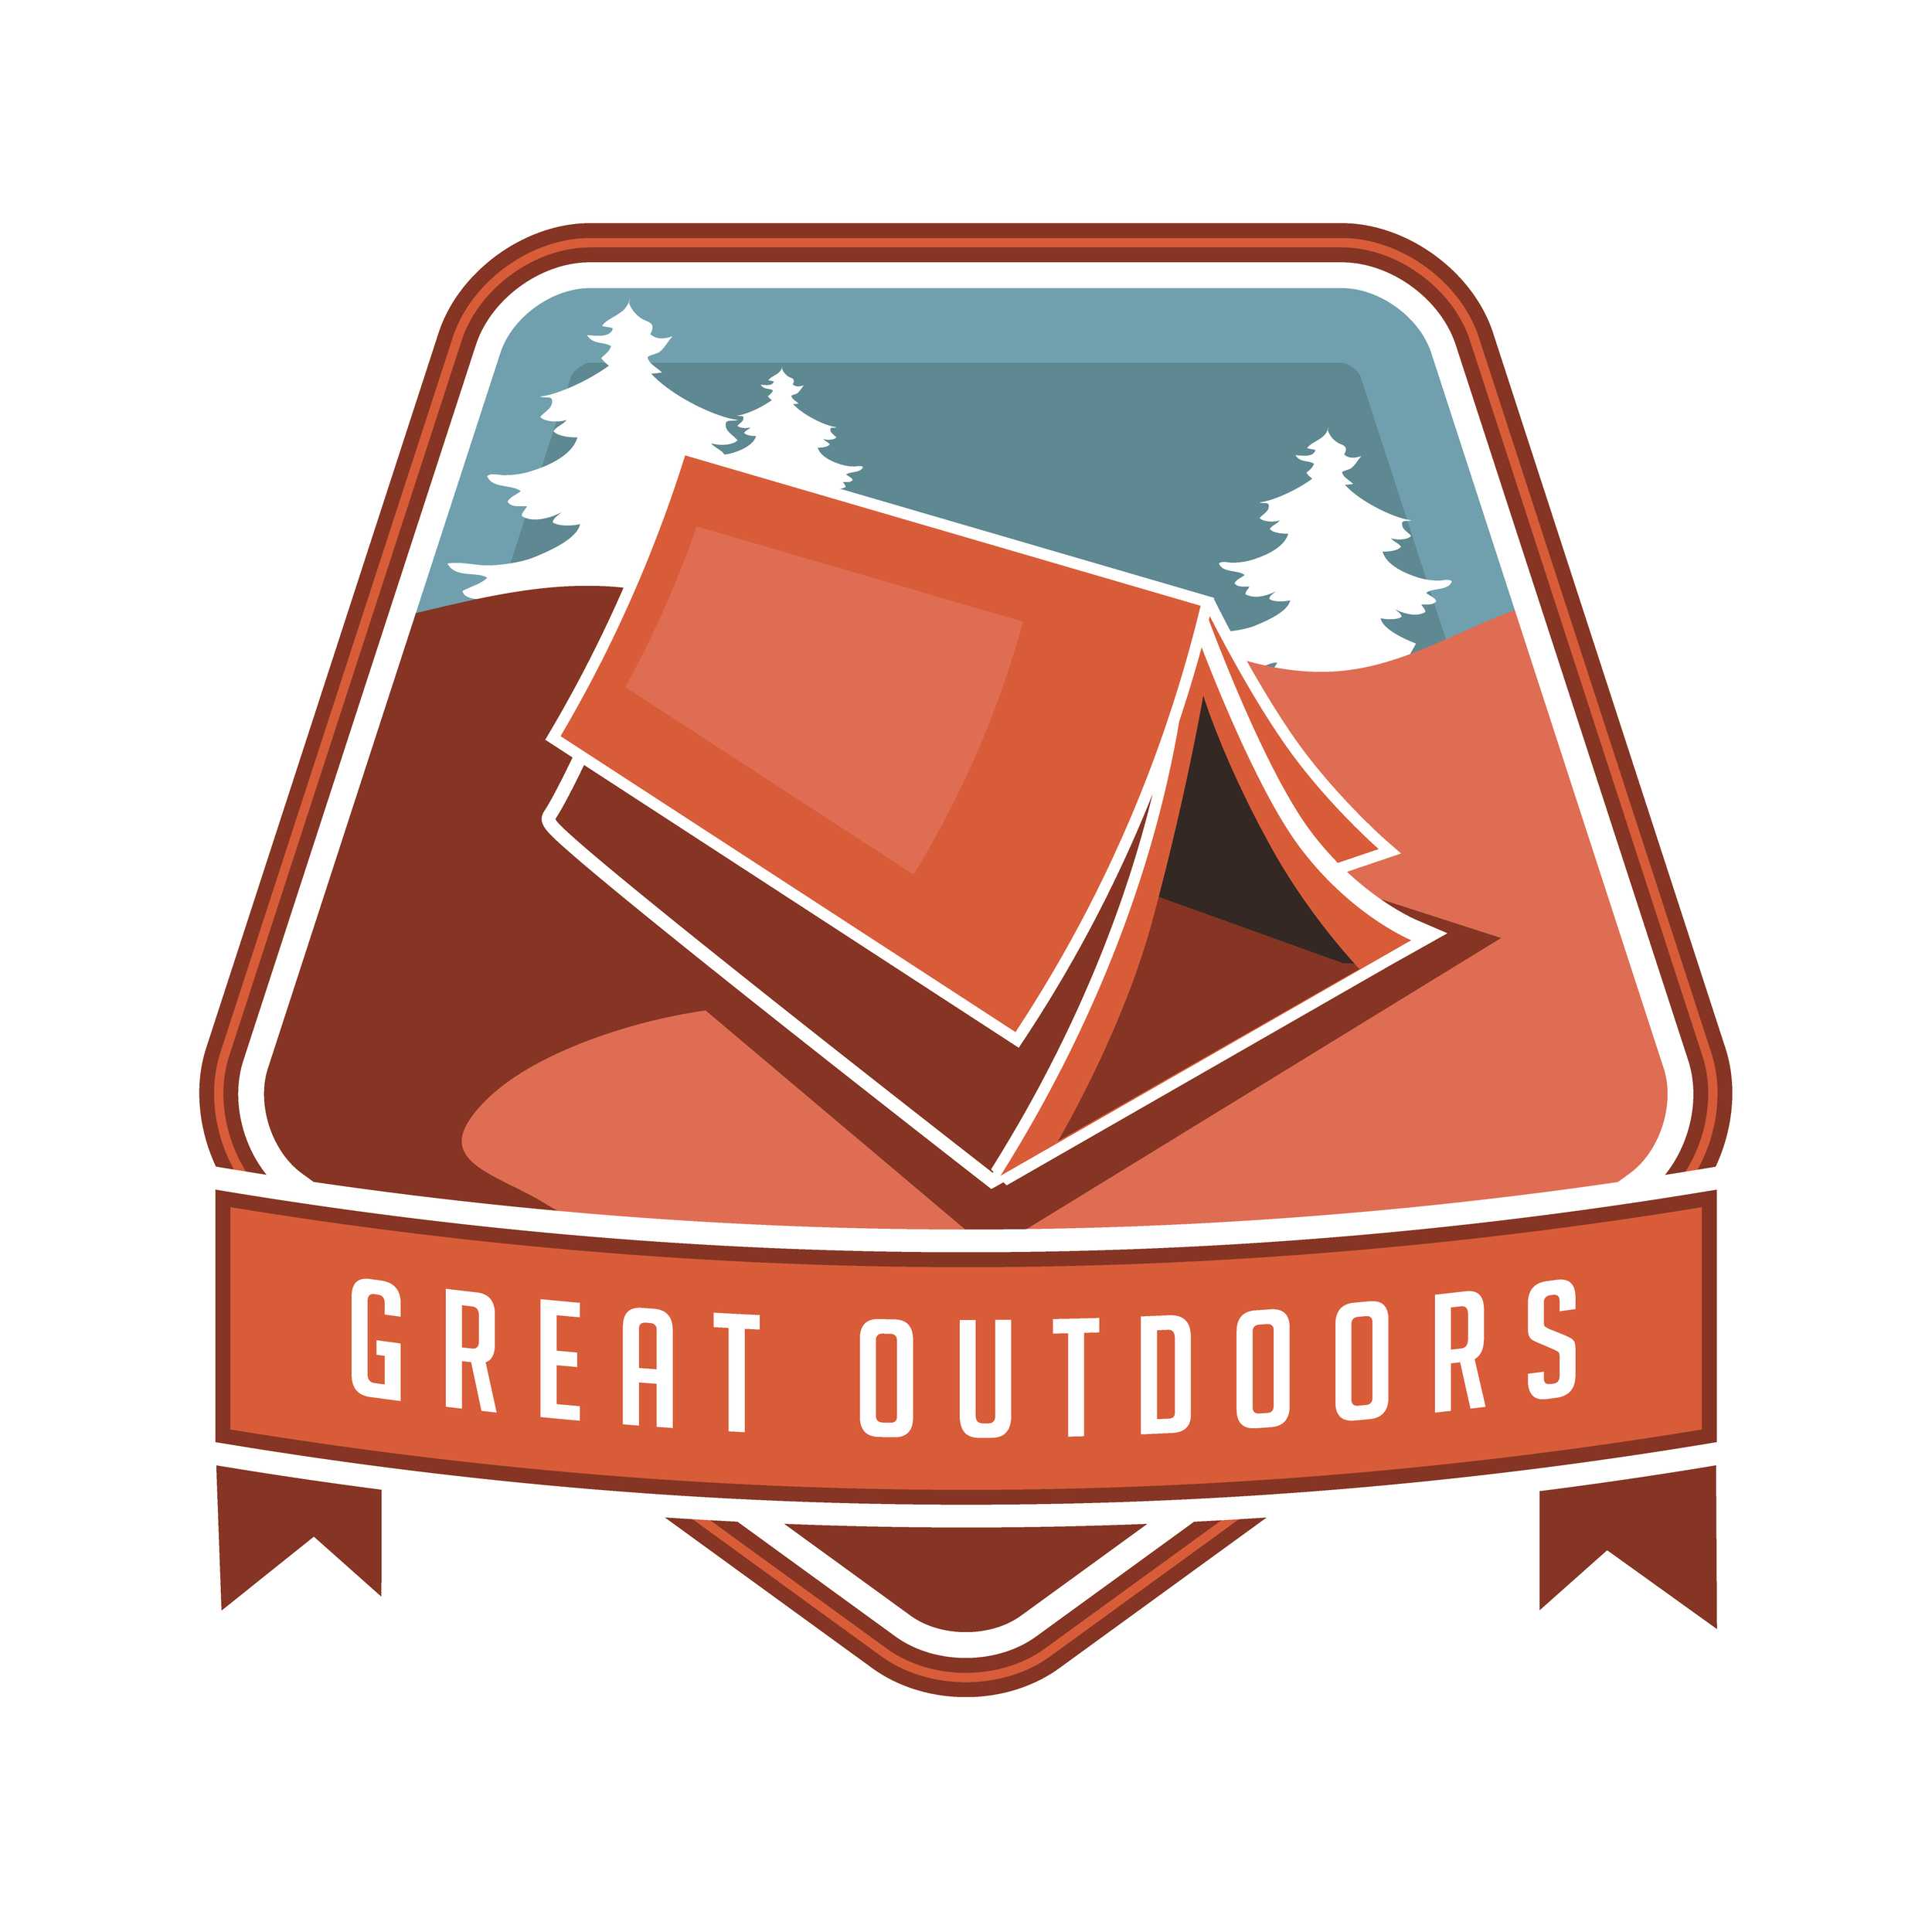 Great_Outdoors_Badge_Pentagon.jpg